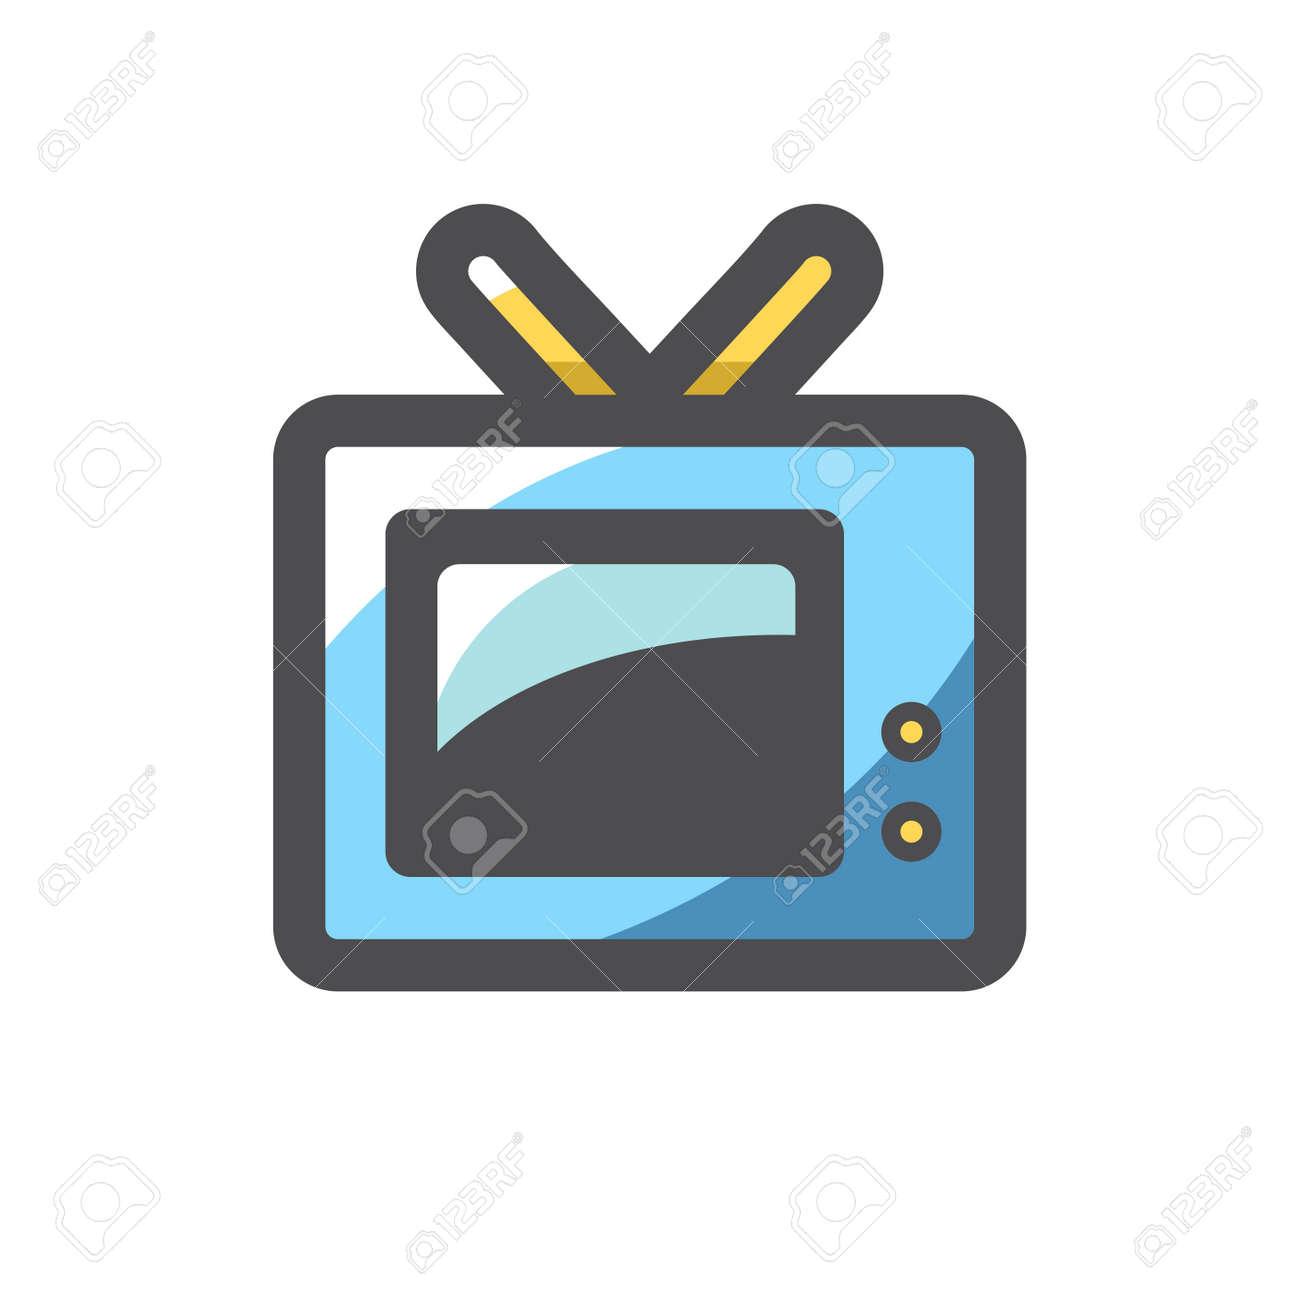 Old retro TV Vector icon Cartoon illustration. - 171392940